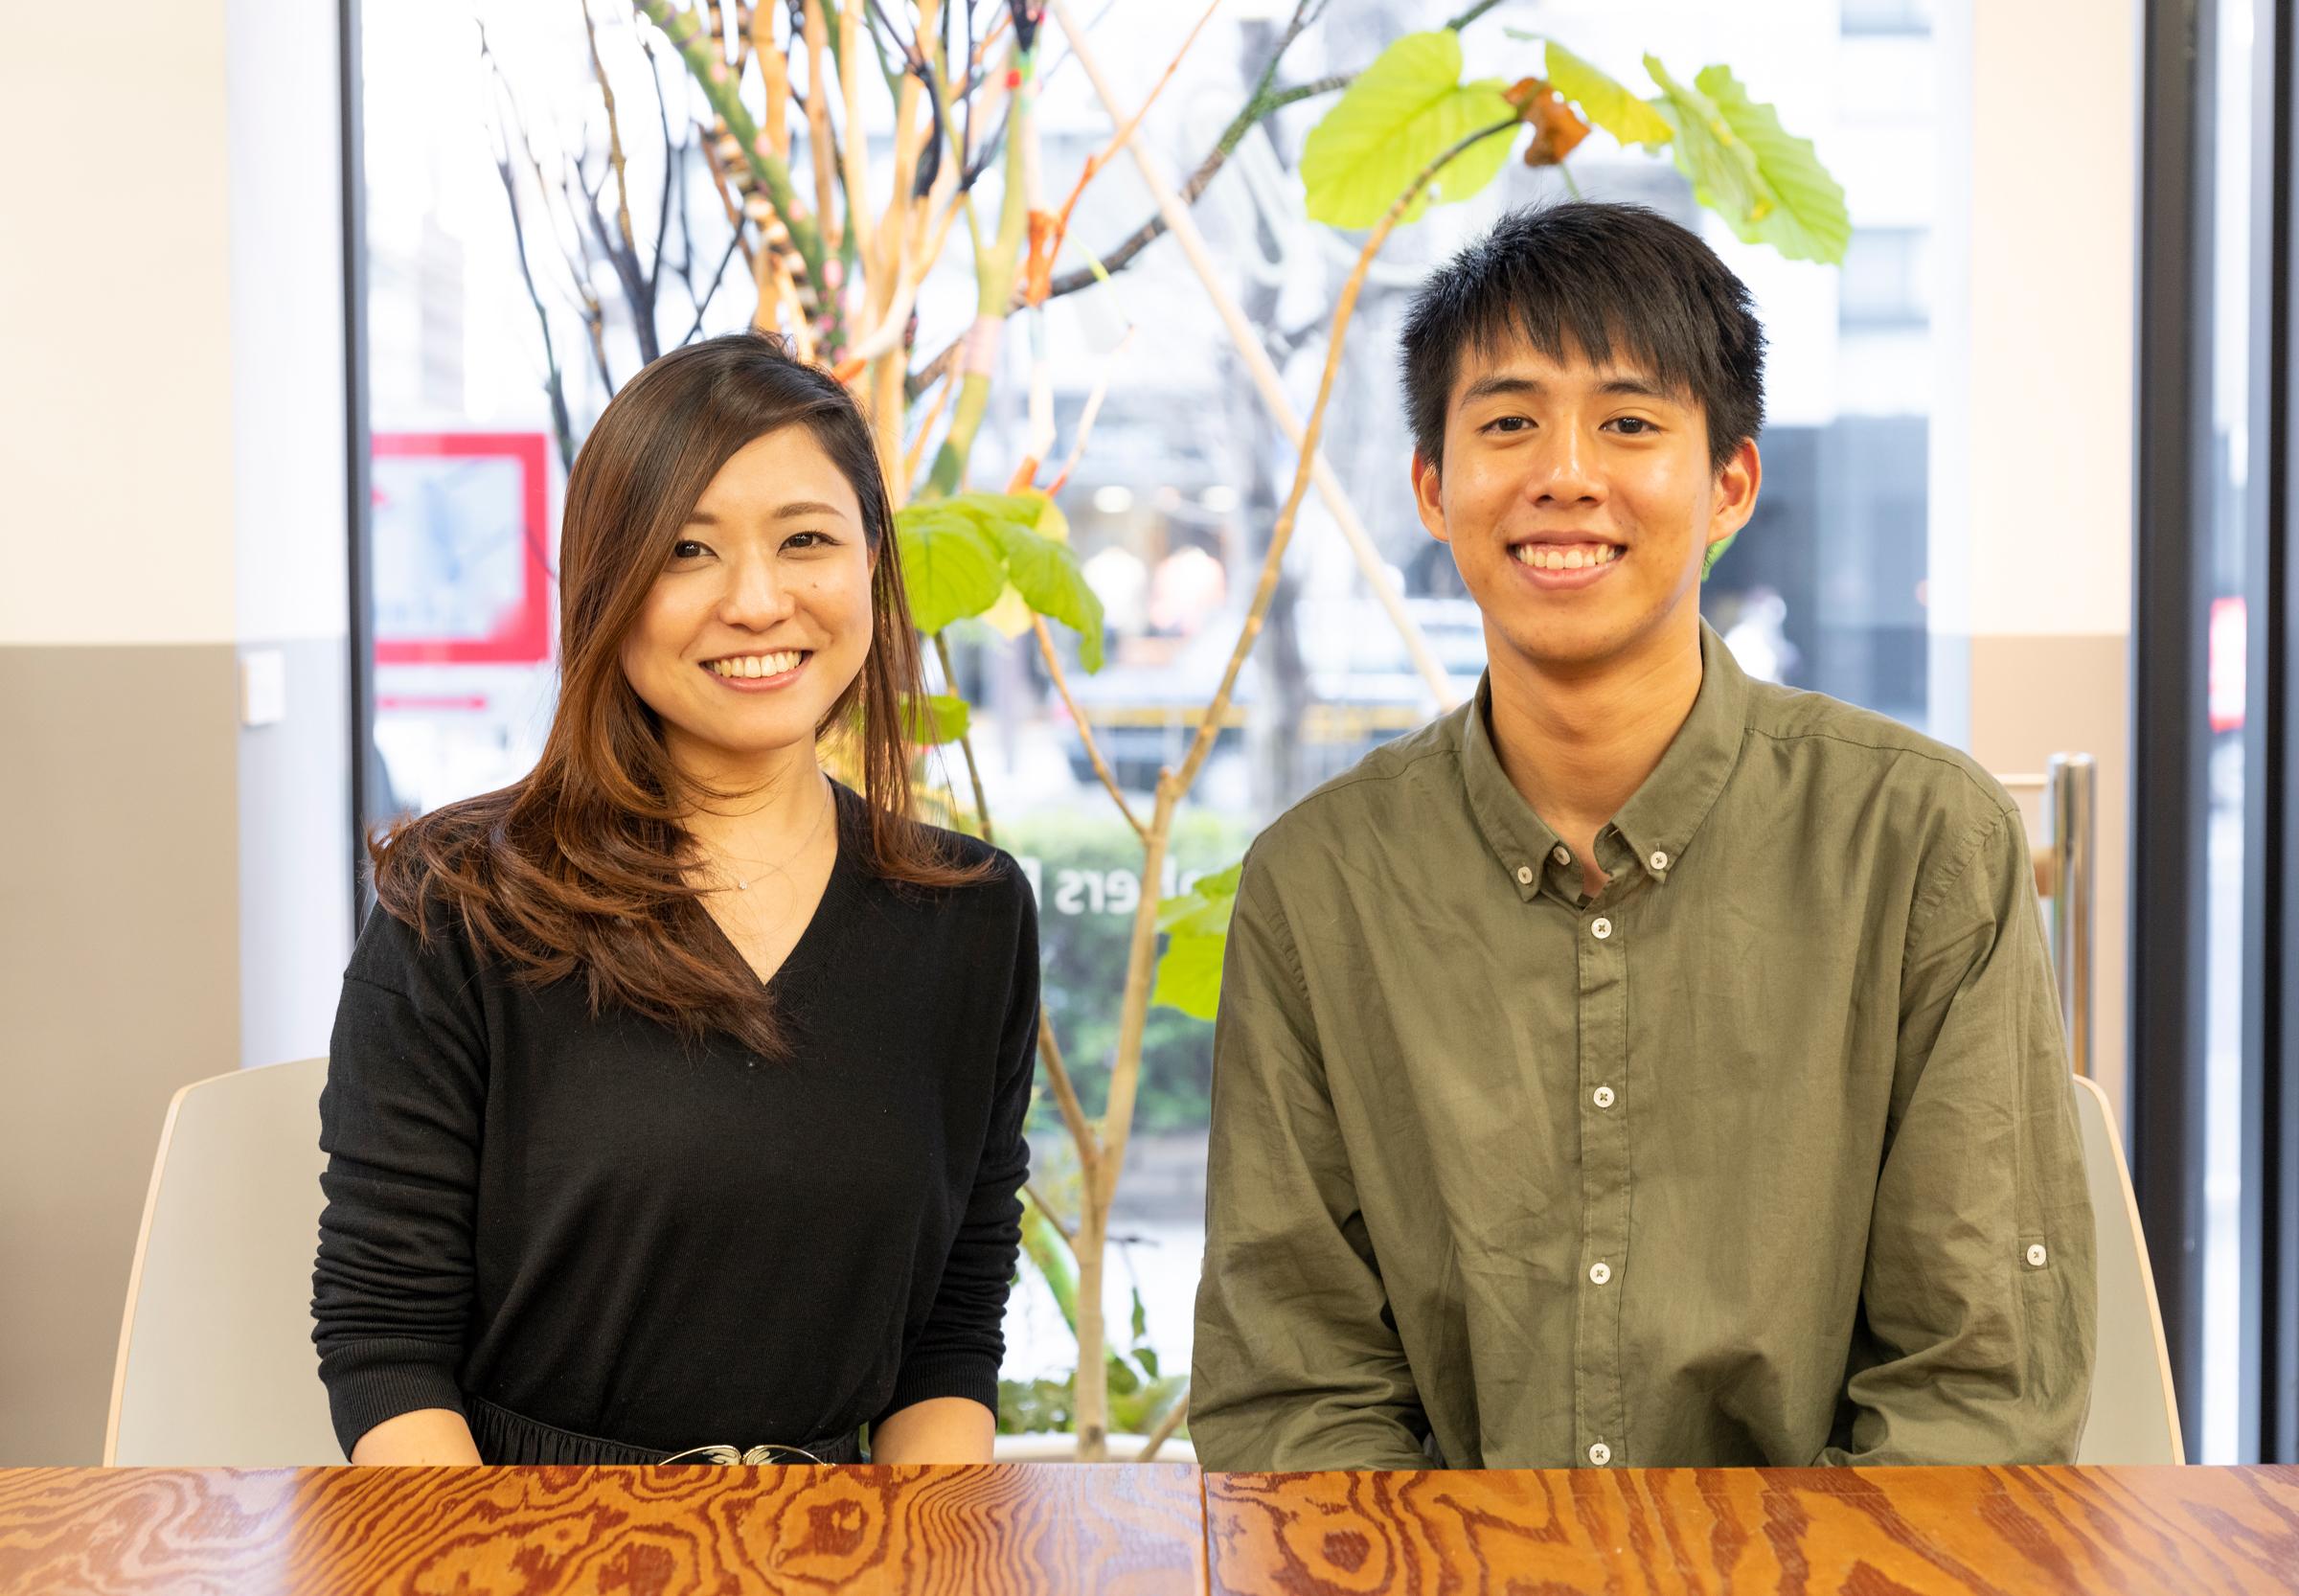 「Robotex Japan」CCOのピォー 豊氏(右)と、理事の大野愛弓氏(左)